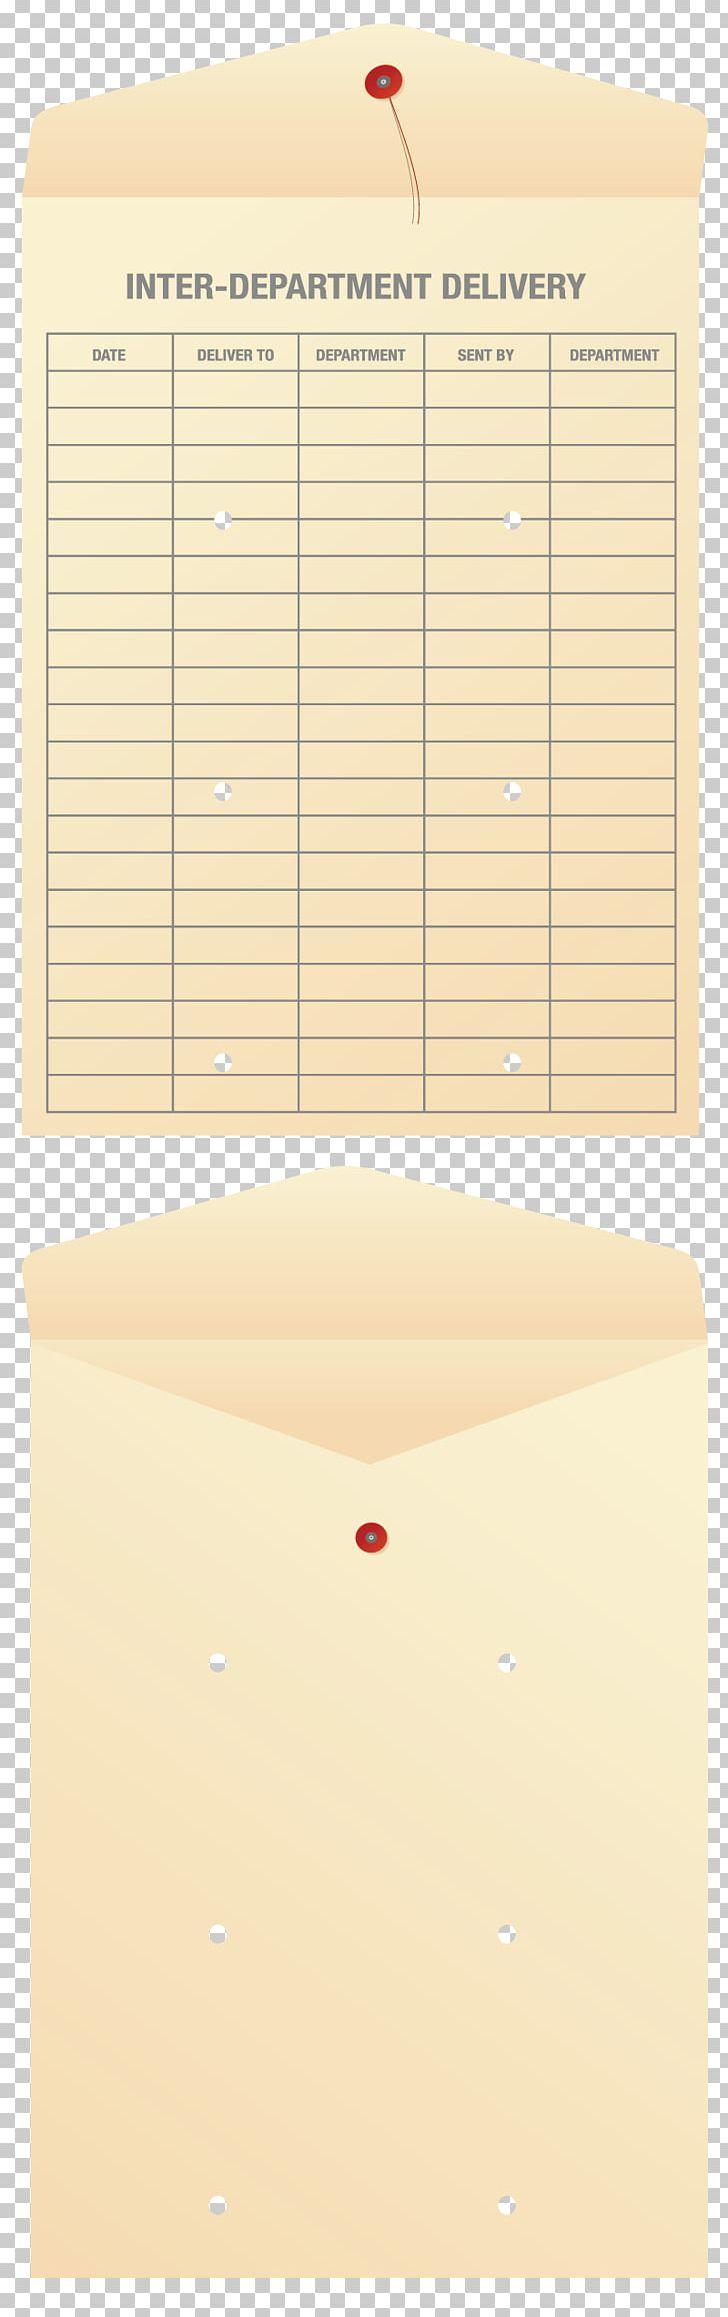 Paper Font PNG, Clipart, Art, Paper, Paper Fan Free PNG Download